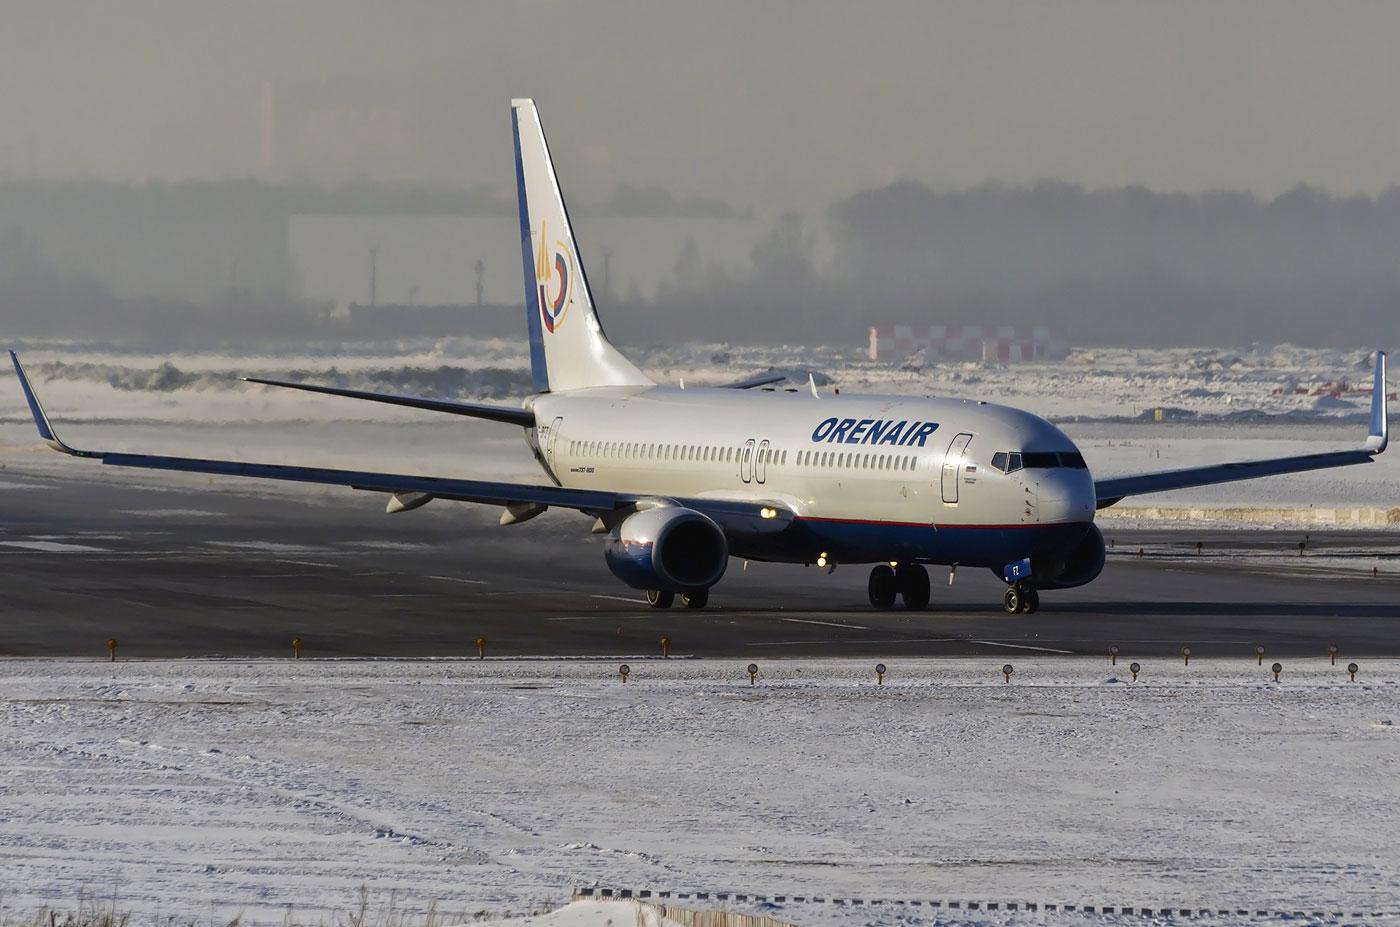 b-737/800 схема салона оренбургские авиалинии